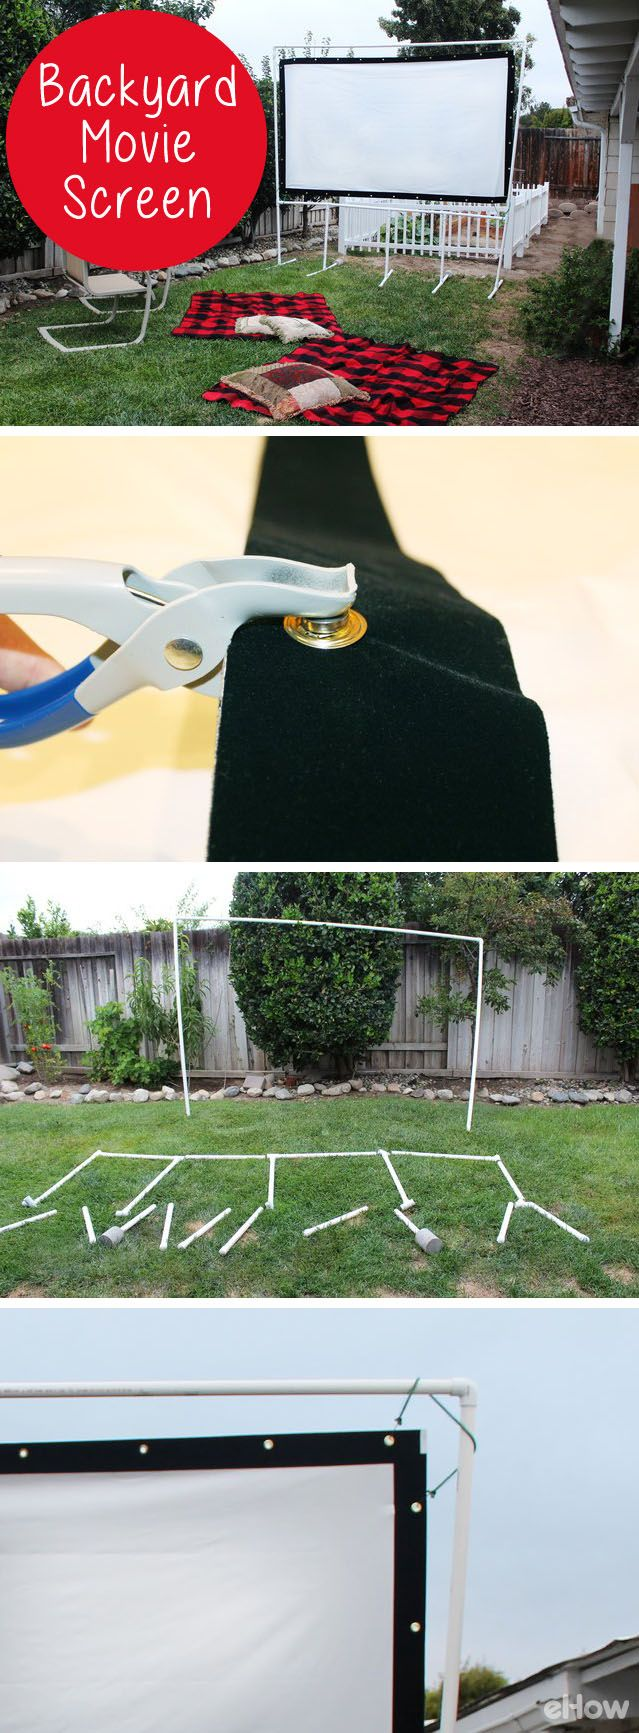 how to make a backyard movie screen backyard movie screen